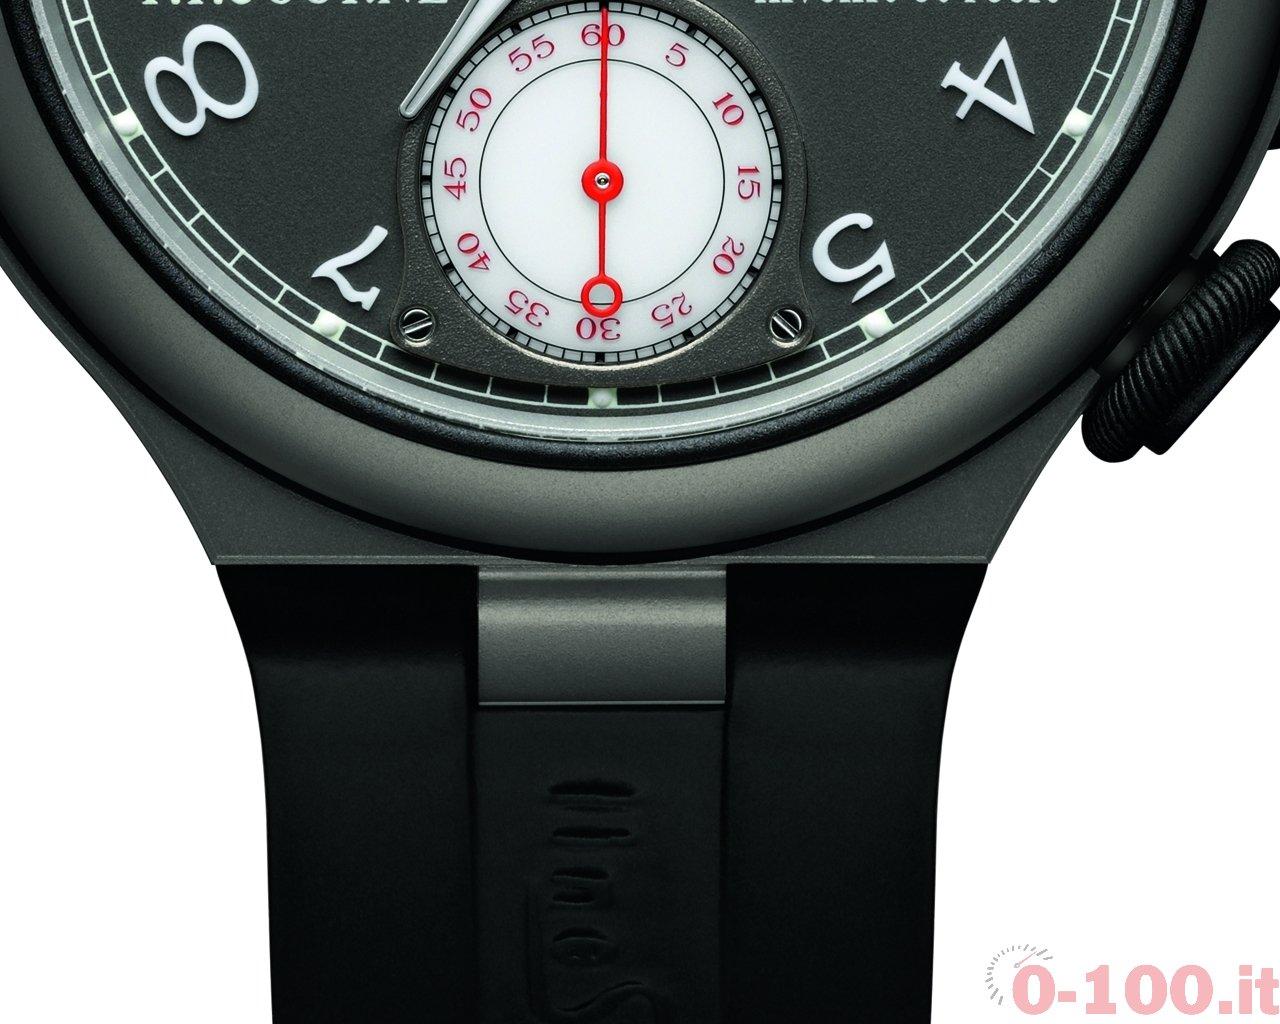 f-p-journe-octa-sport-titanium-prezzo-price-0-100_10